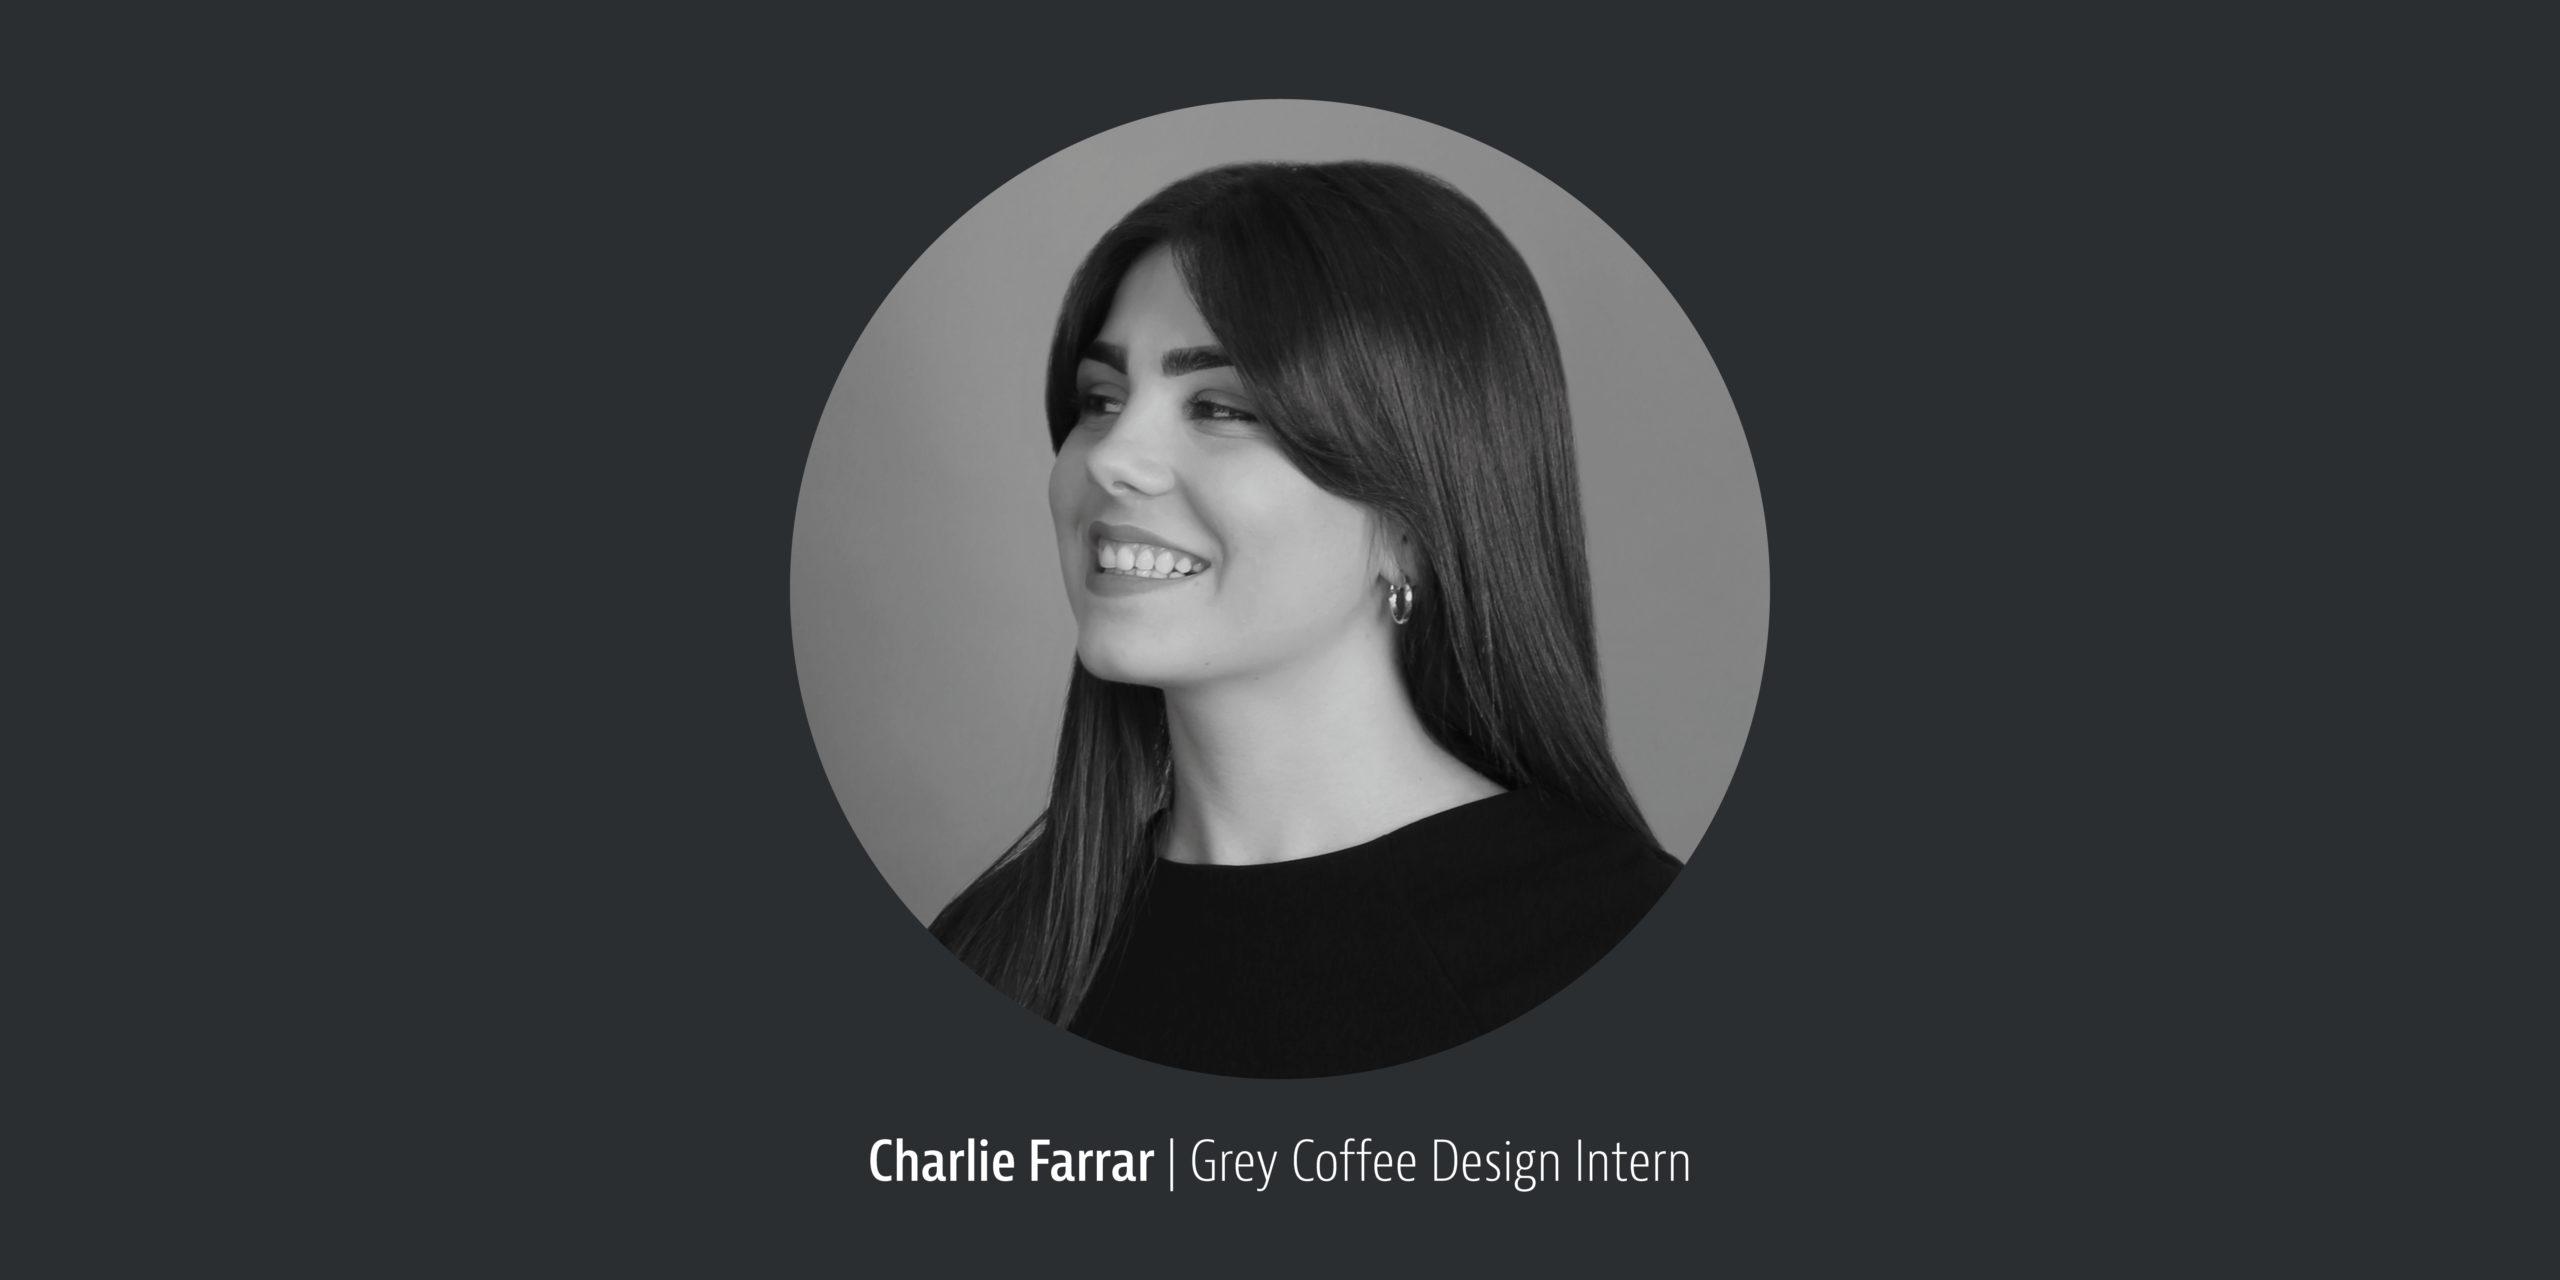 Grey Coffee Team Member: Charlie Farrar